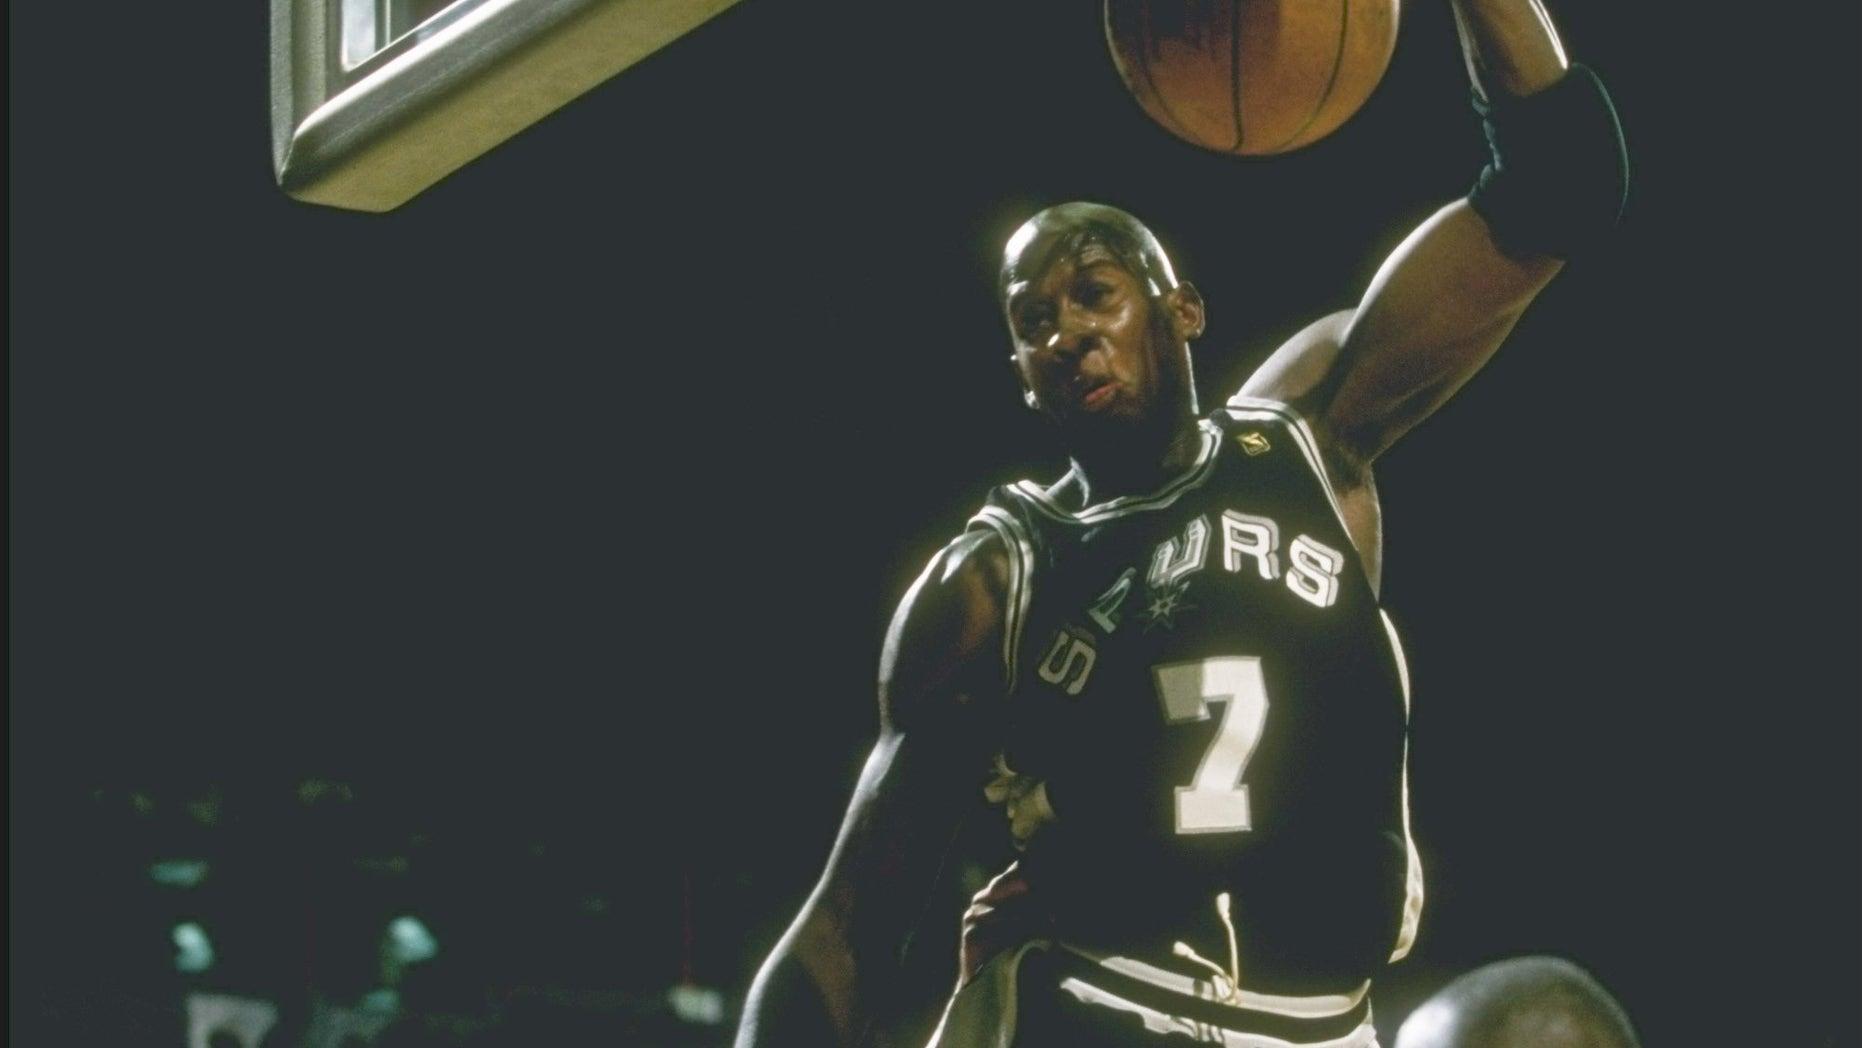 Forward Carl Herrera of the San Antonio Spurs in a 1997 file photo.